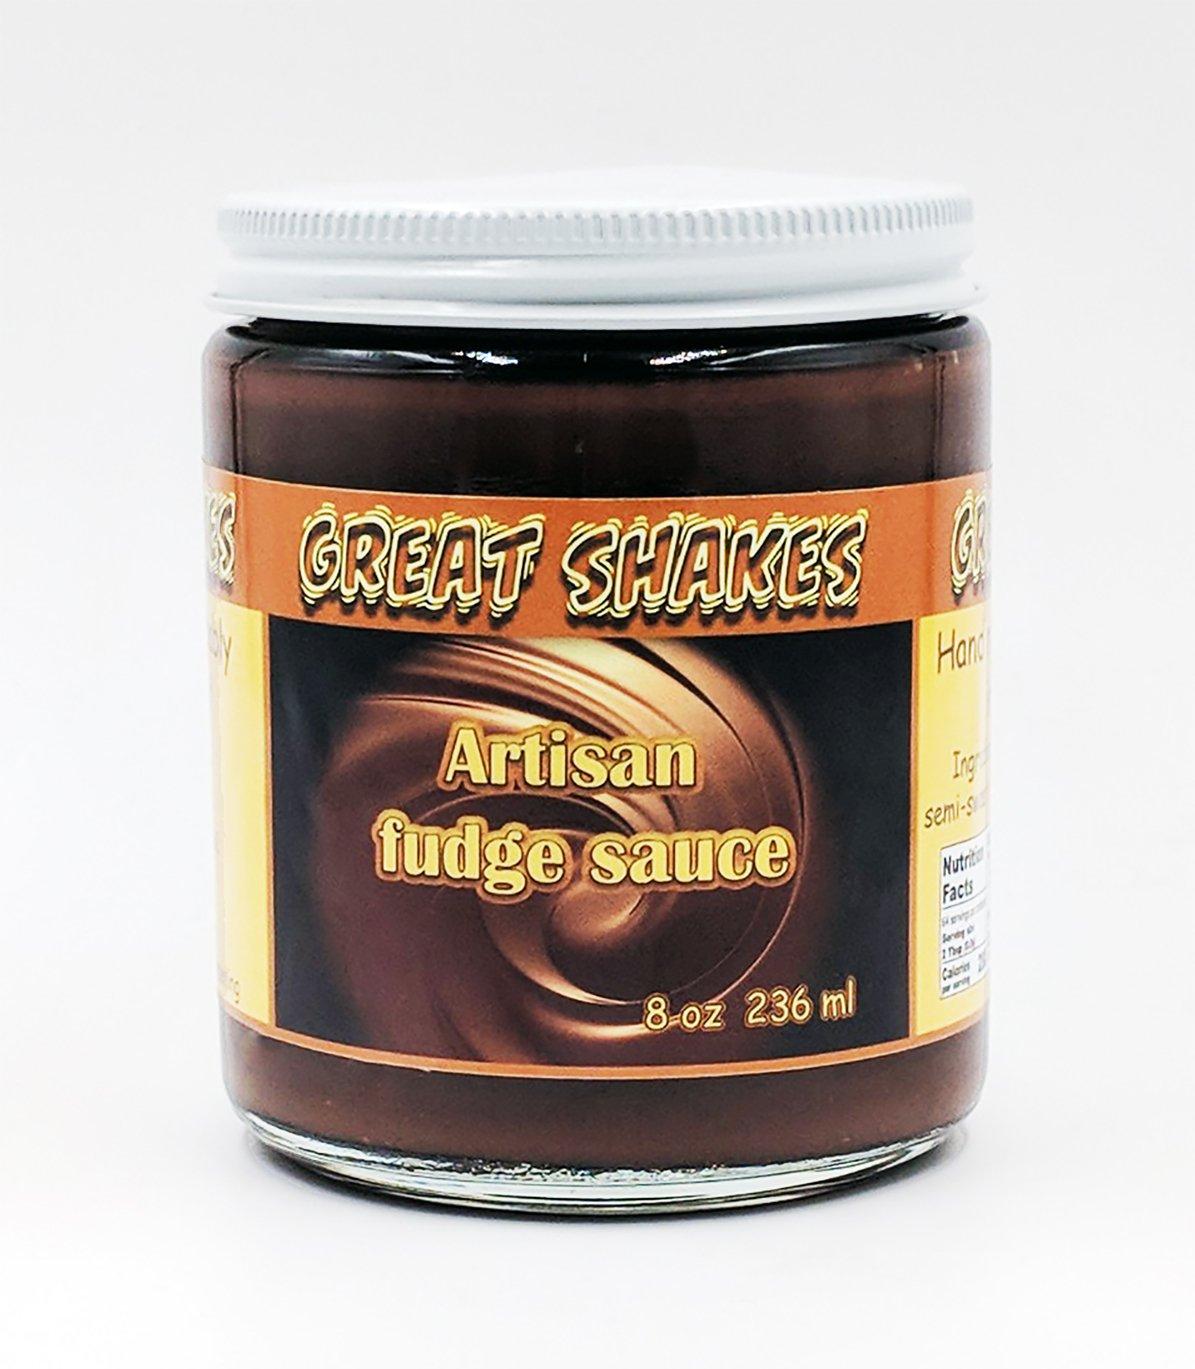 Great Shakes of Palm Springs Gourmet Fudge Sauce